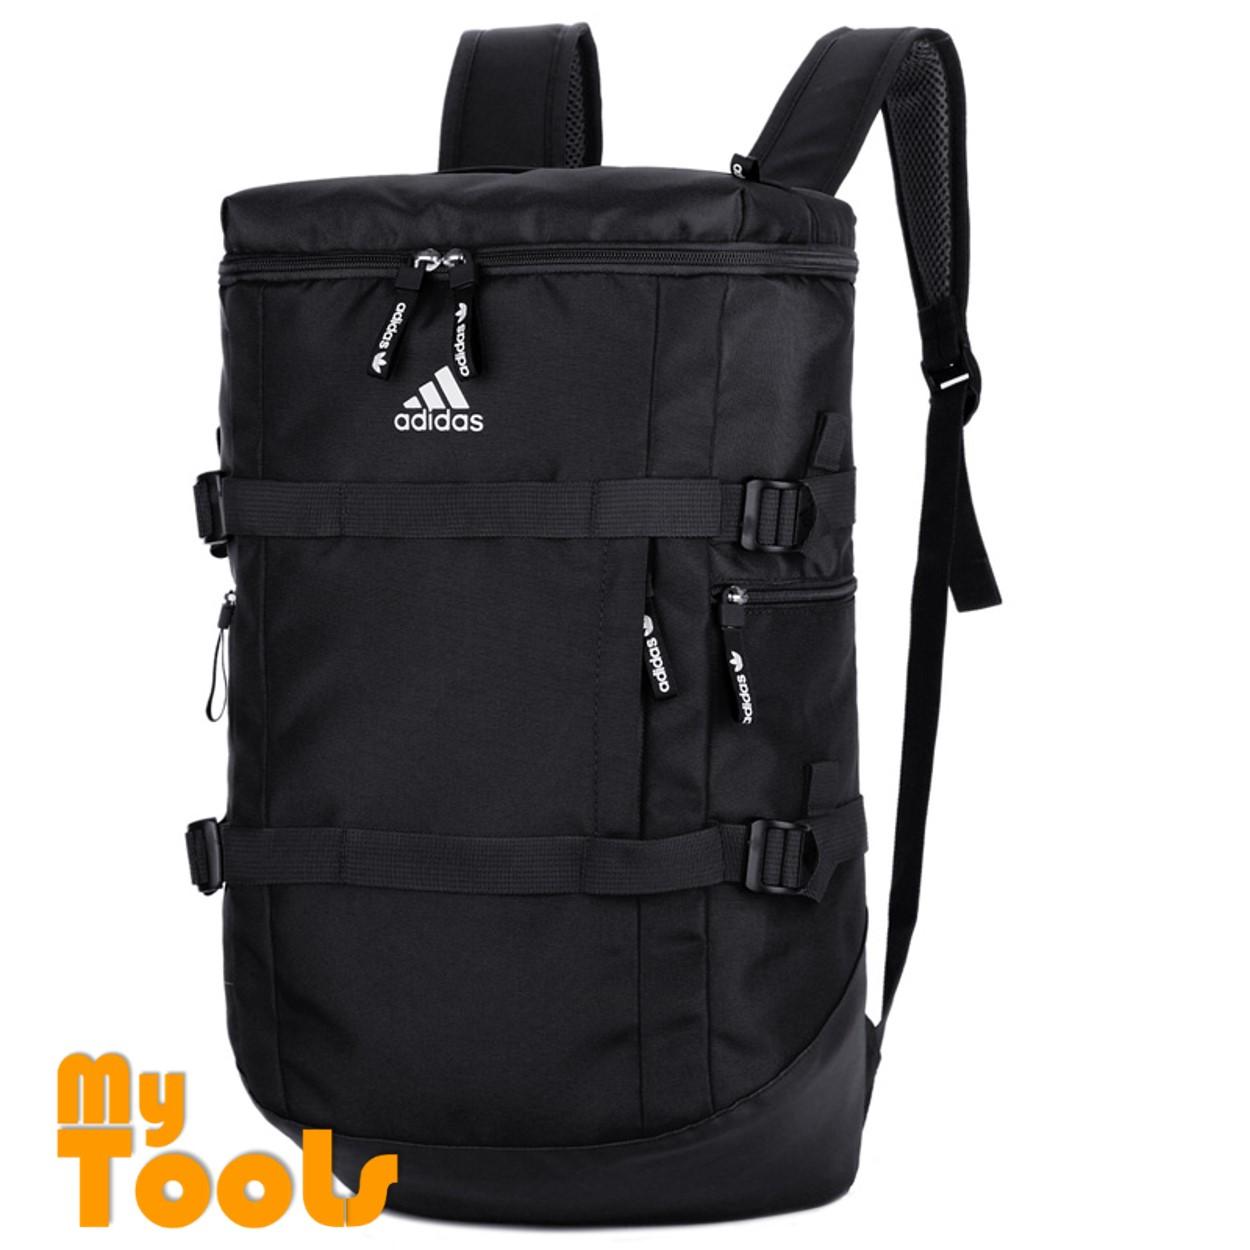 a45832b35b26a Adidas School Bags At Total Sports